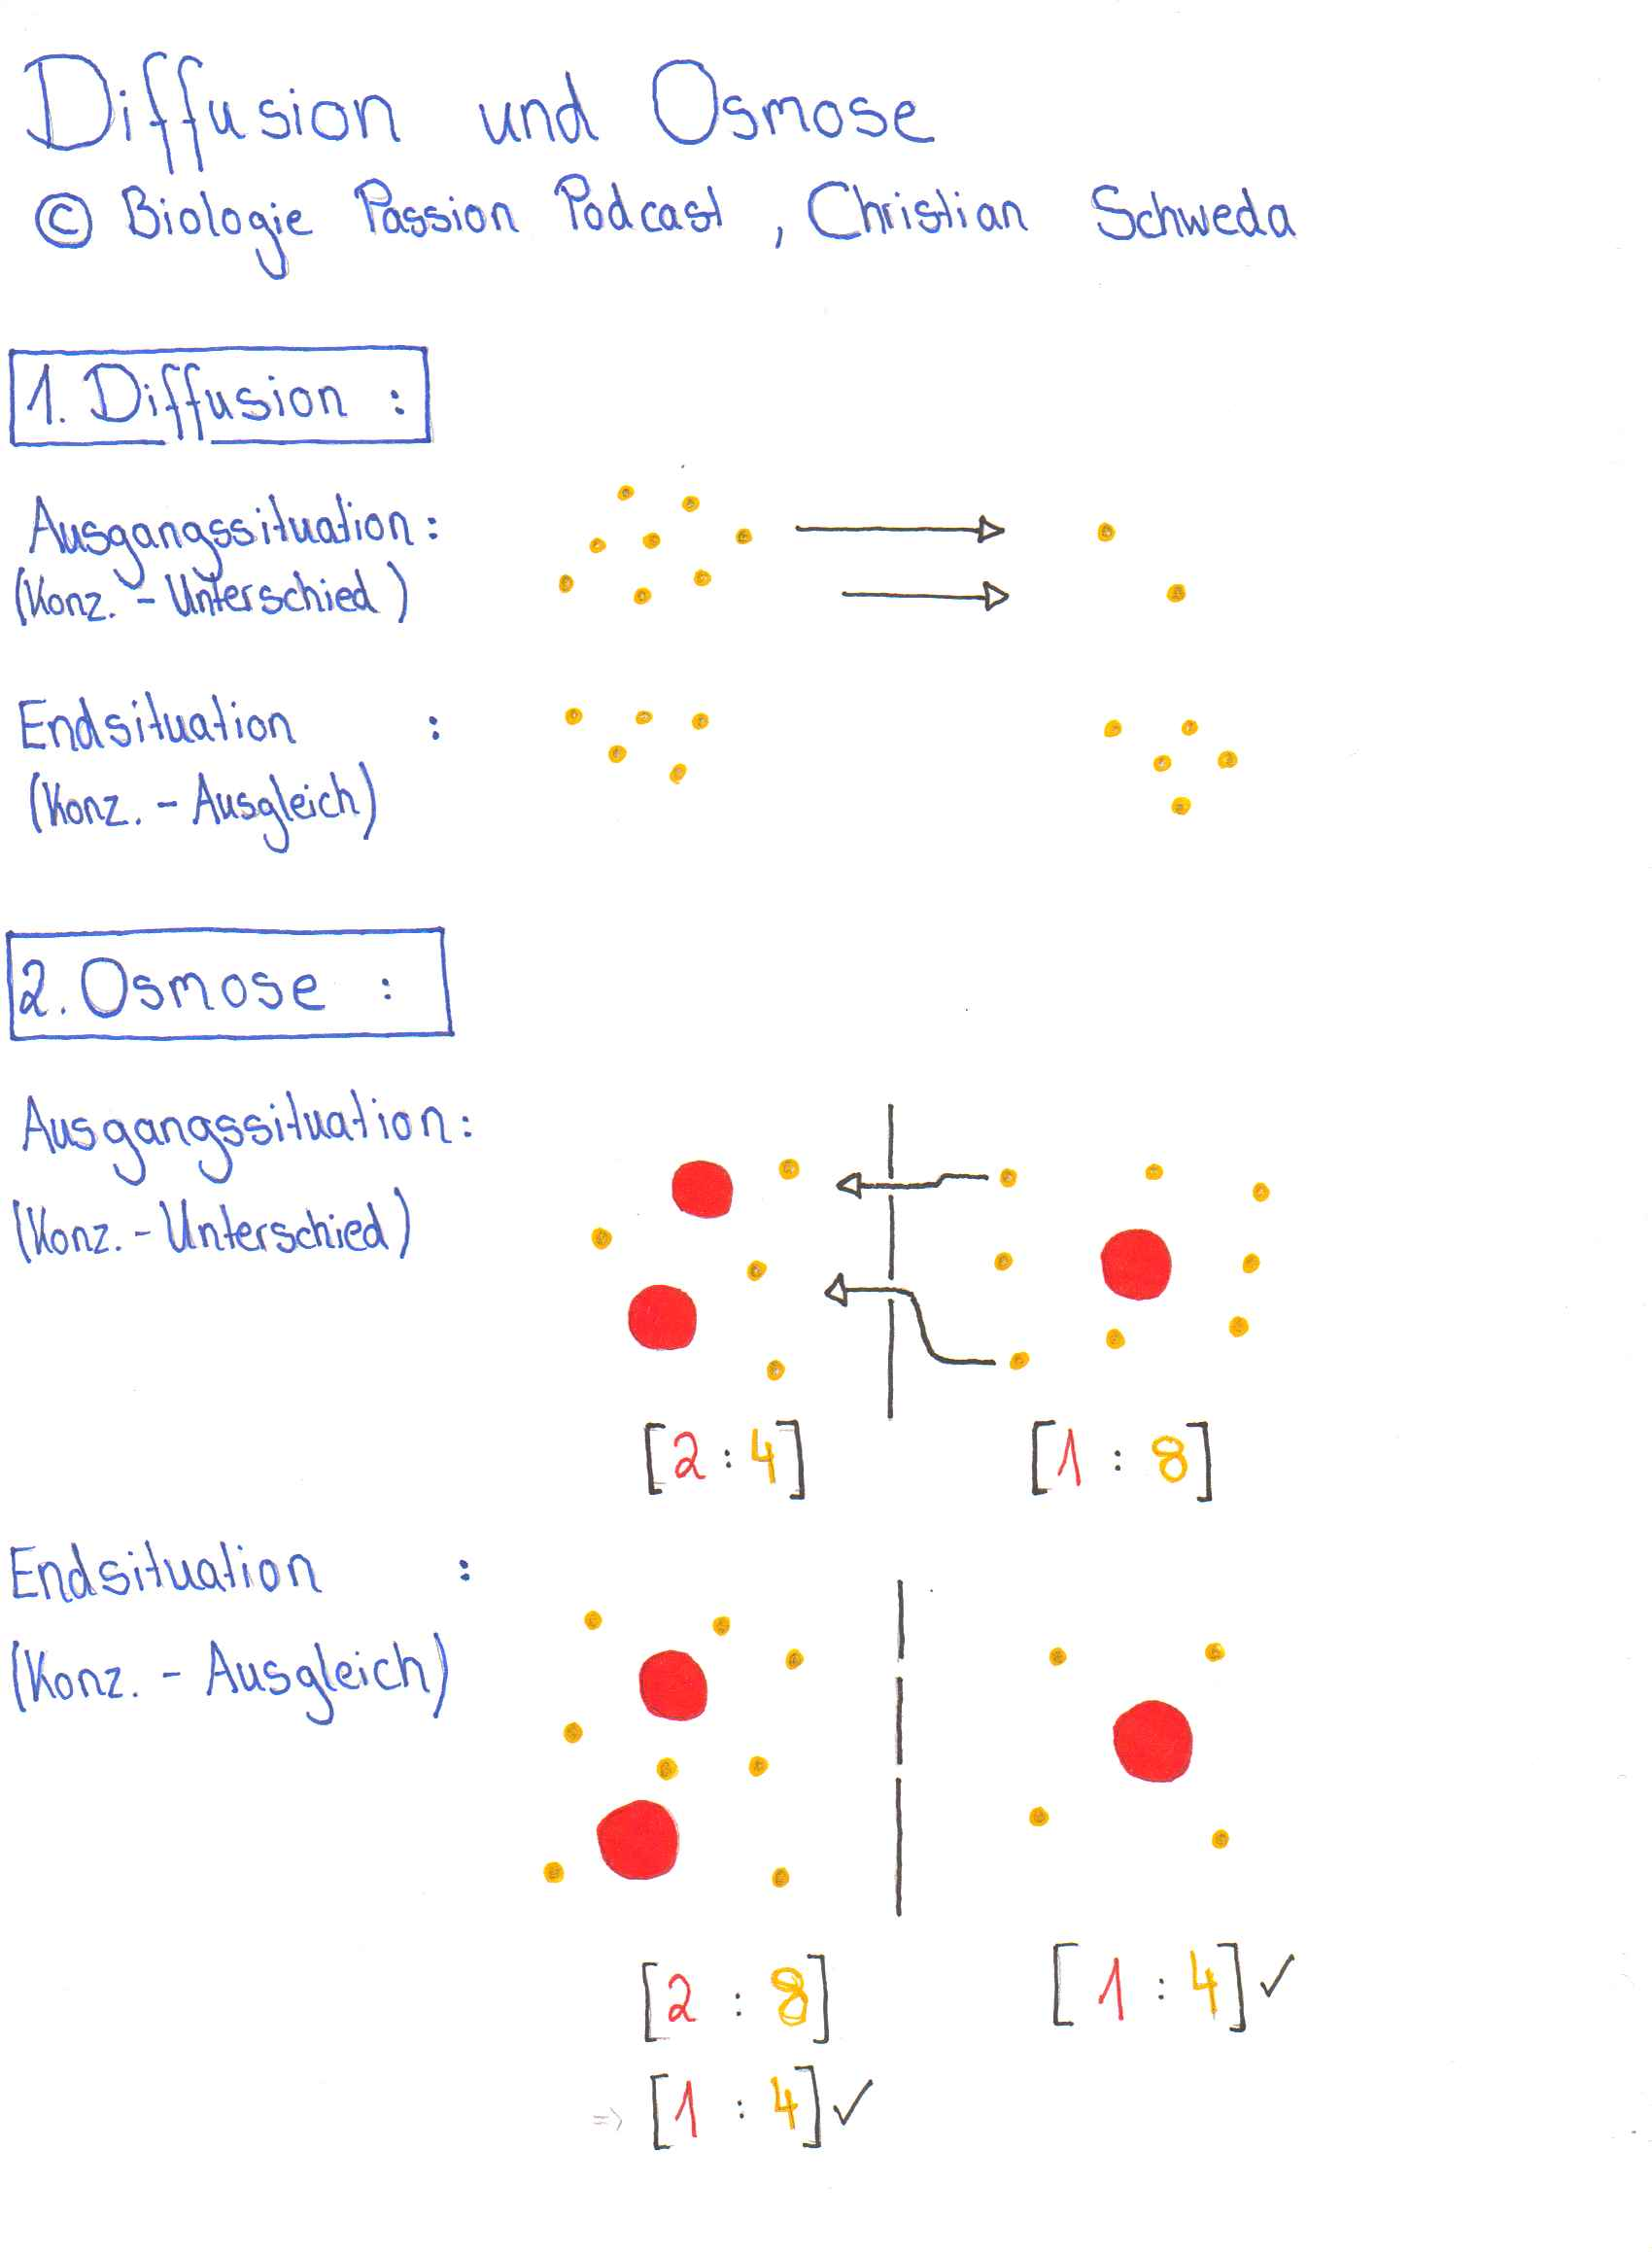 Diffusion und Osmose Arbeitsblatt - Biologie Passion Podcast